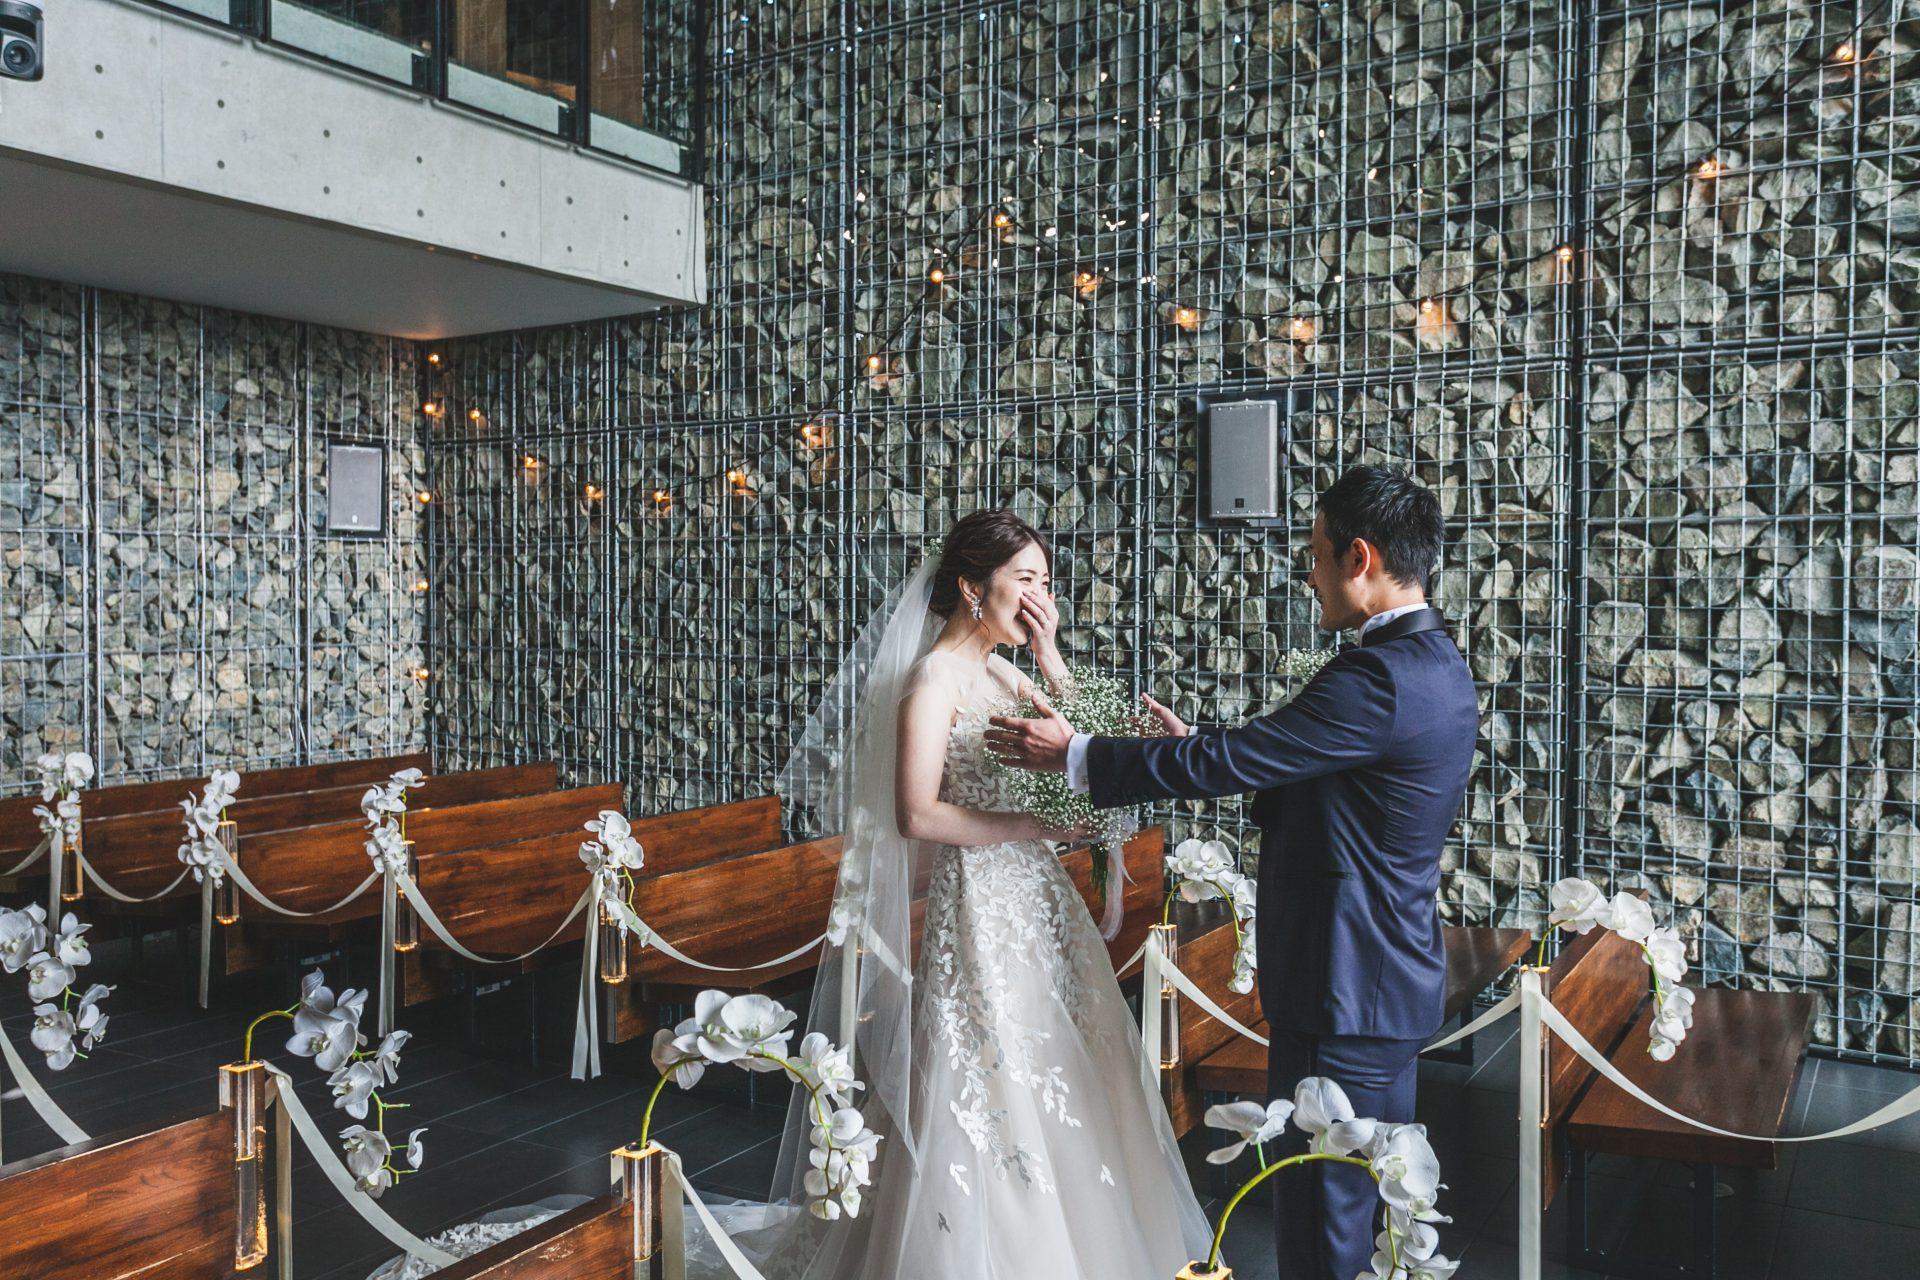 THE TREAT DRESSING神戸店にお取り扱いのあるミラズウィリンガーのリーフの刺繍が美しいウェディングドレスとトリートジェントルマンのミッドナイトブルーのタキシードを身に纏いファーストミートをされたお二人のご紹介